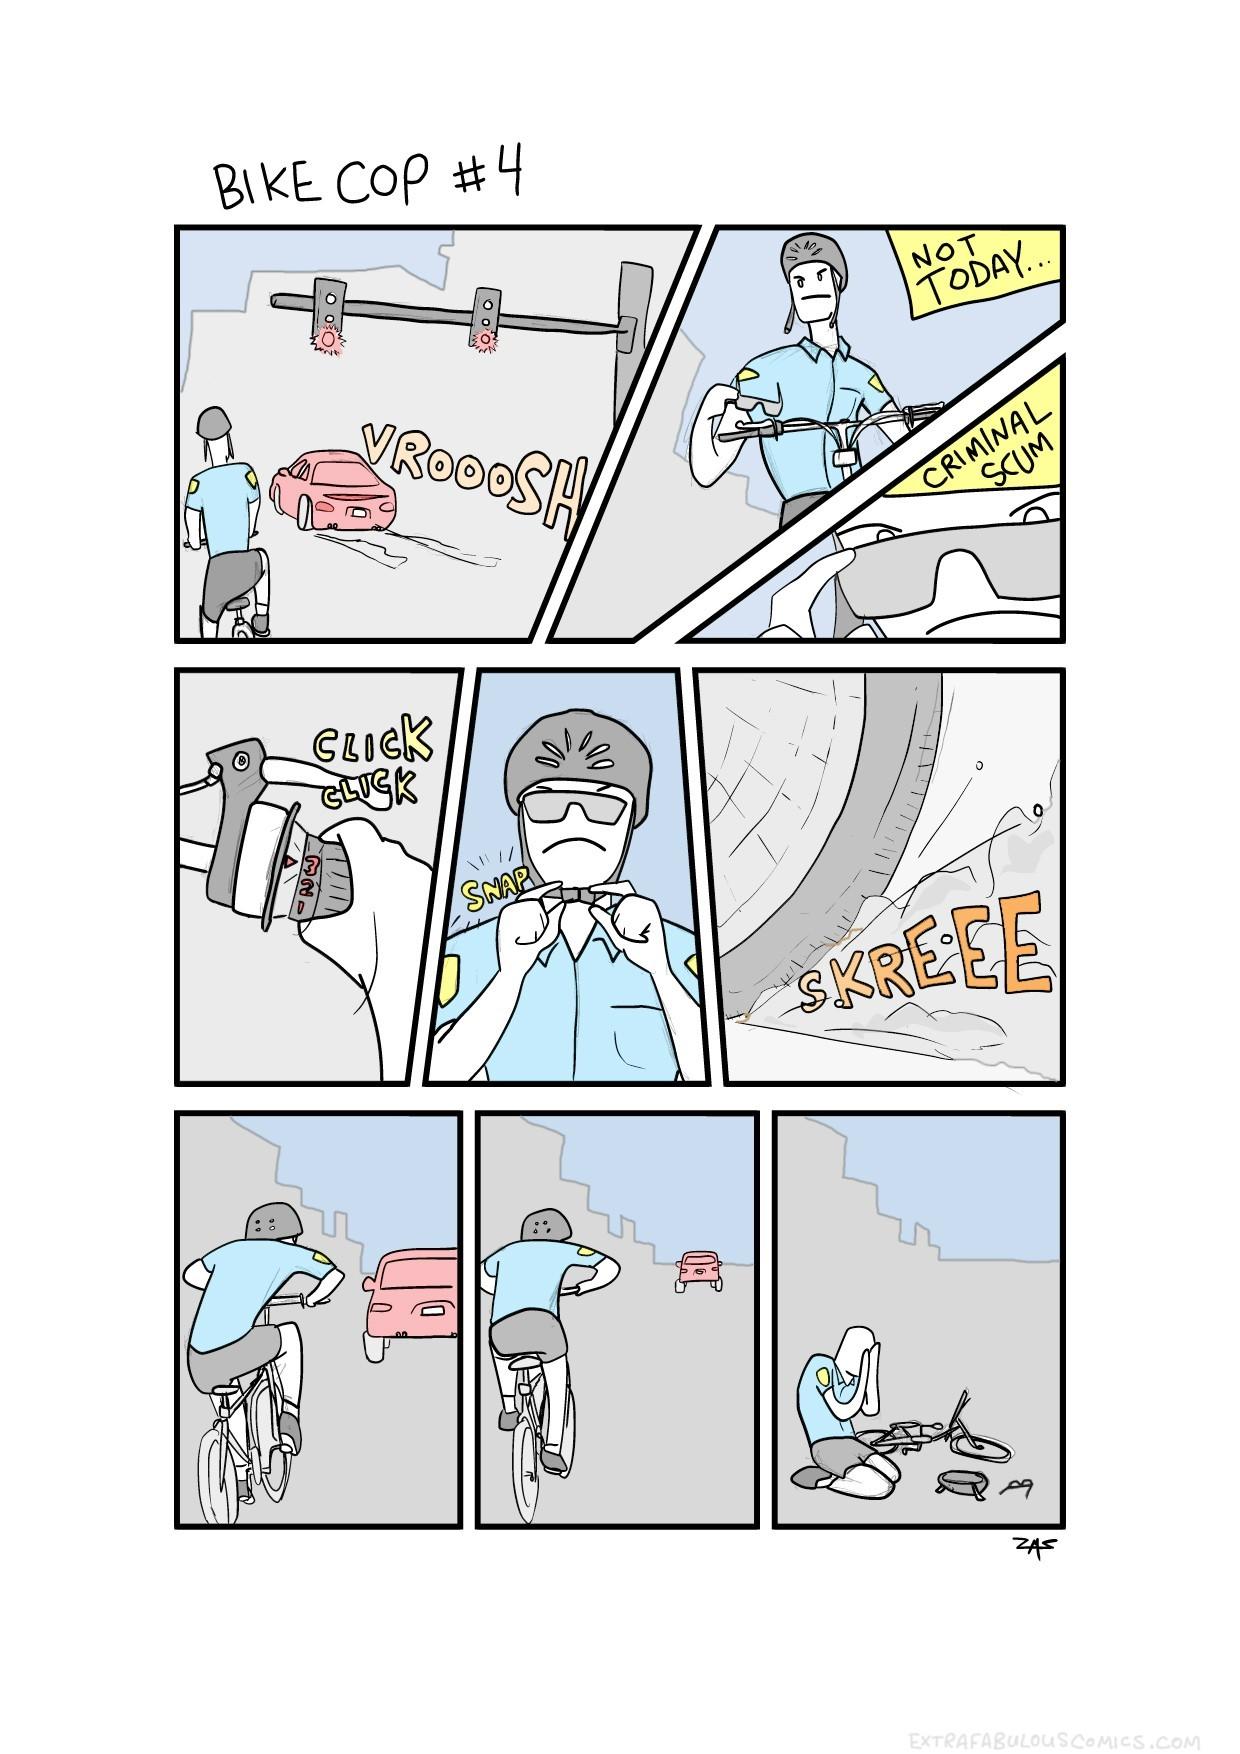 Silly bike cop - meme